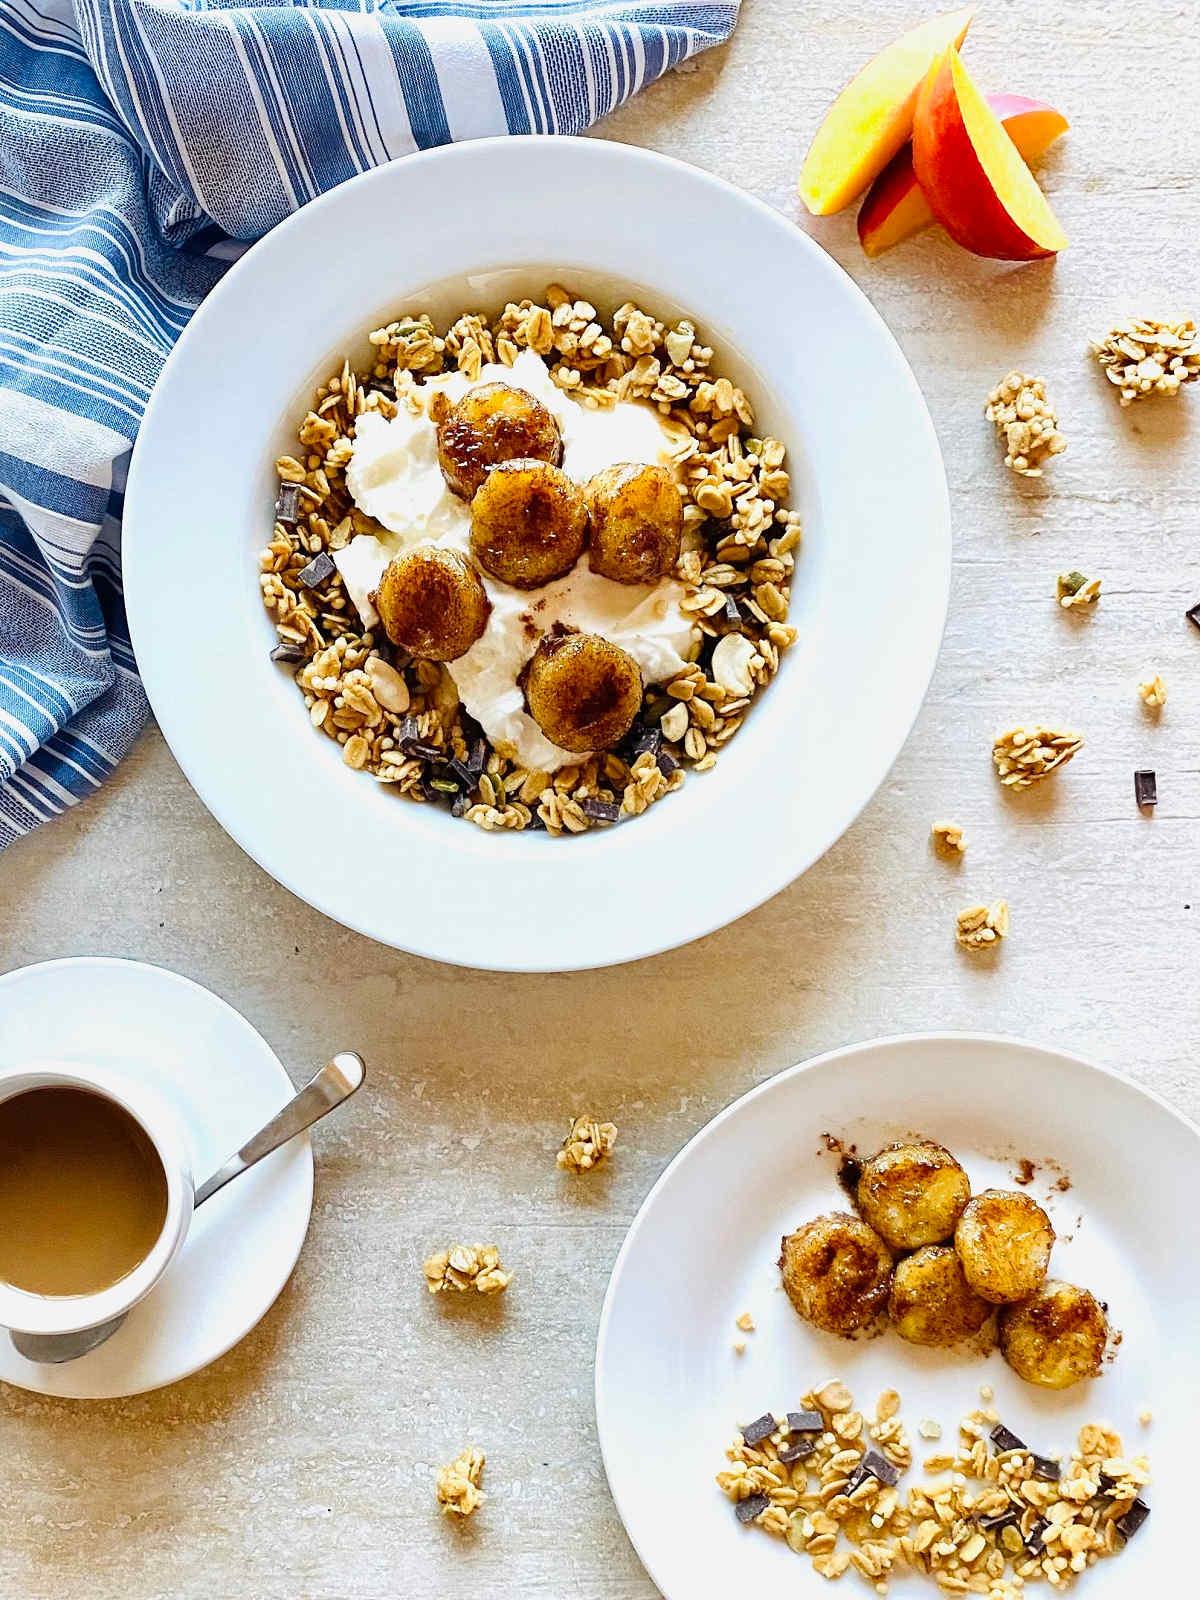 air fryer bananas in a bowl with yogurt and granola next tonectarines